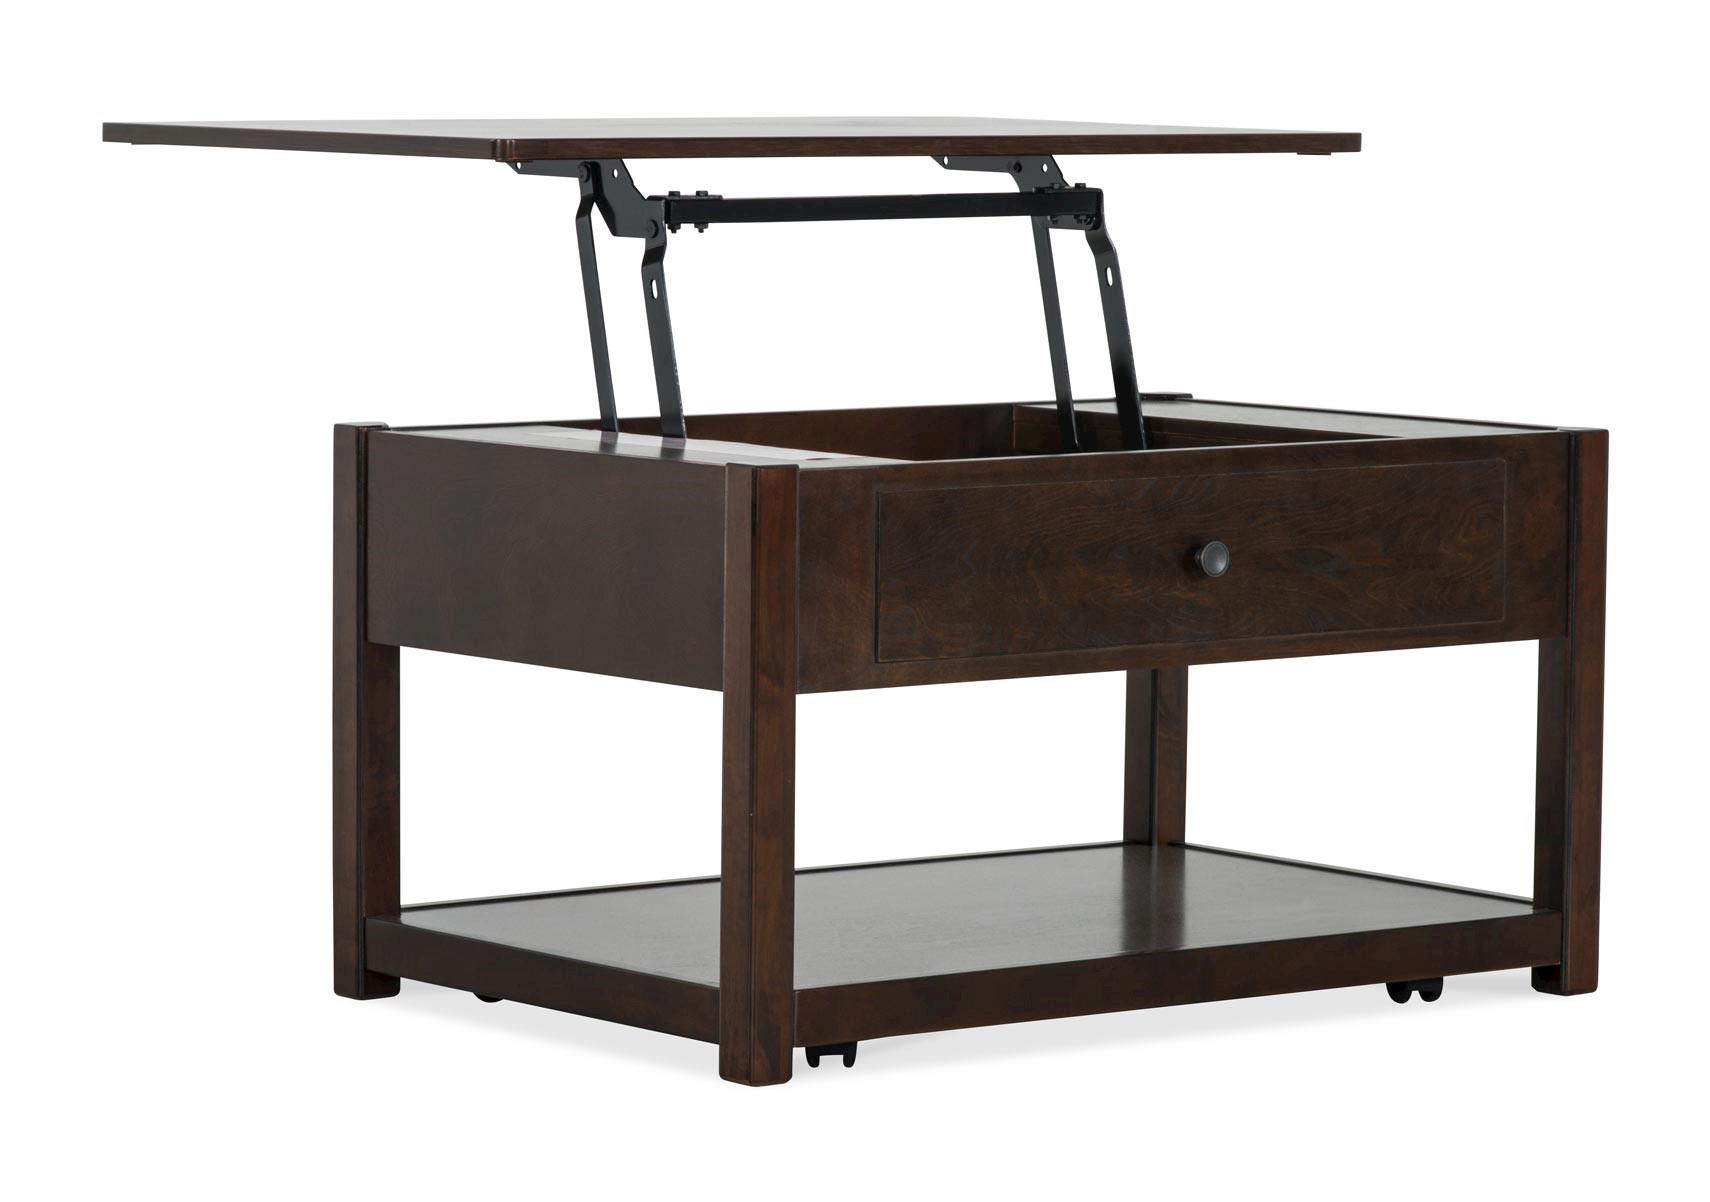 Pleasant Lacks Marion Lift Top Coffee Table Creativecarmelina Interior Chair Design Creativecarmelinacom